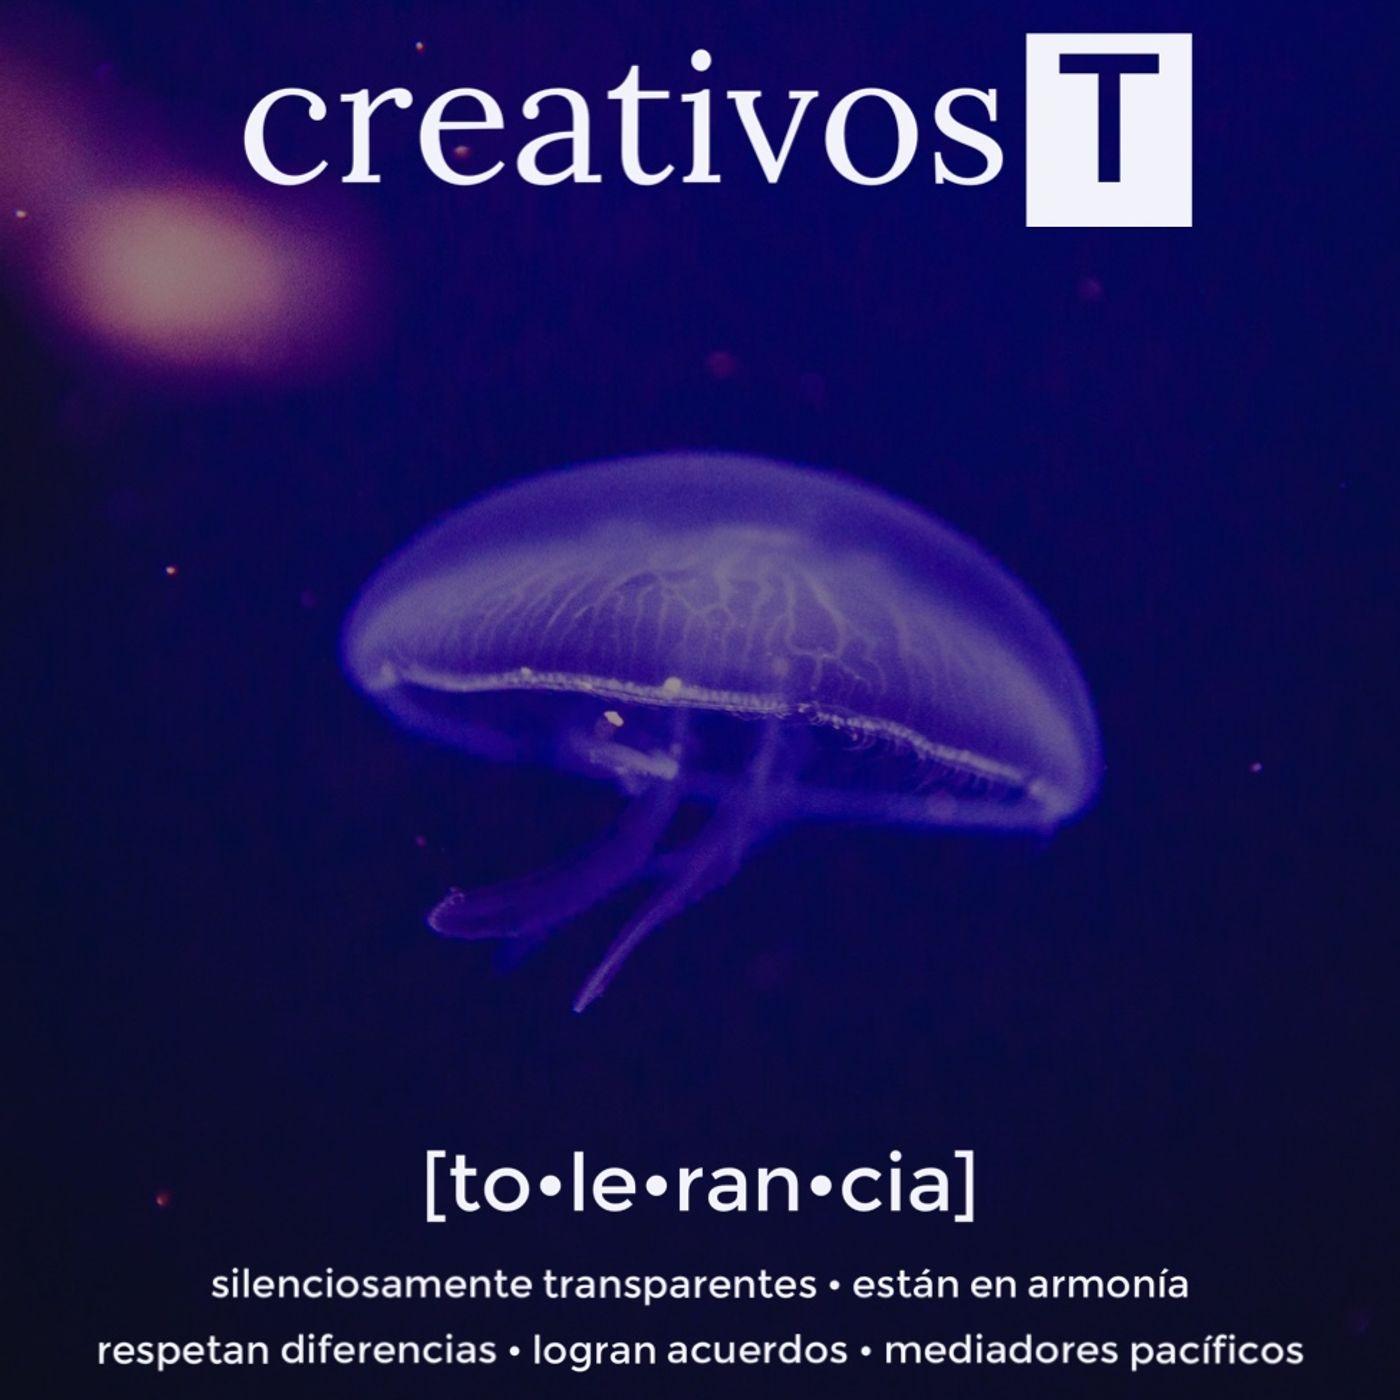 i272 CREATIVOS T